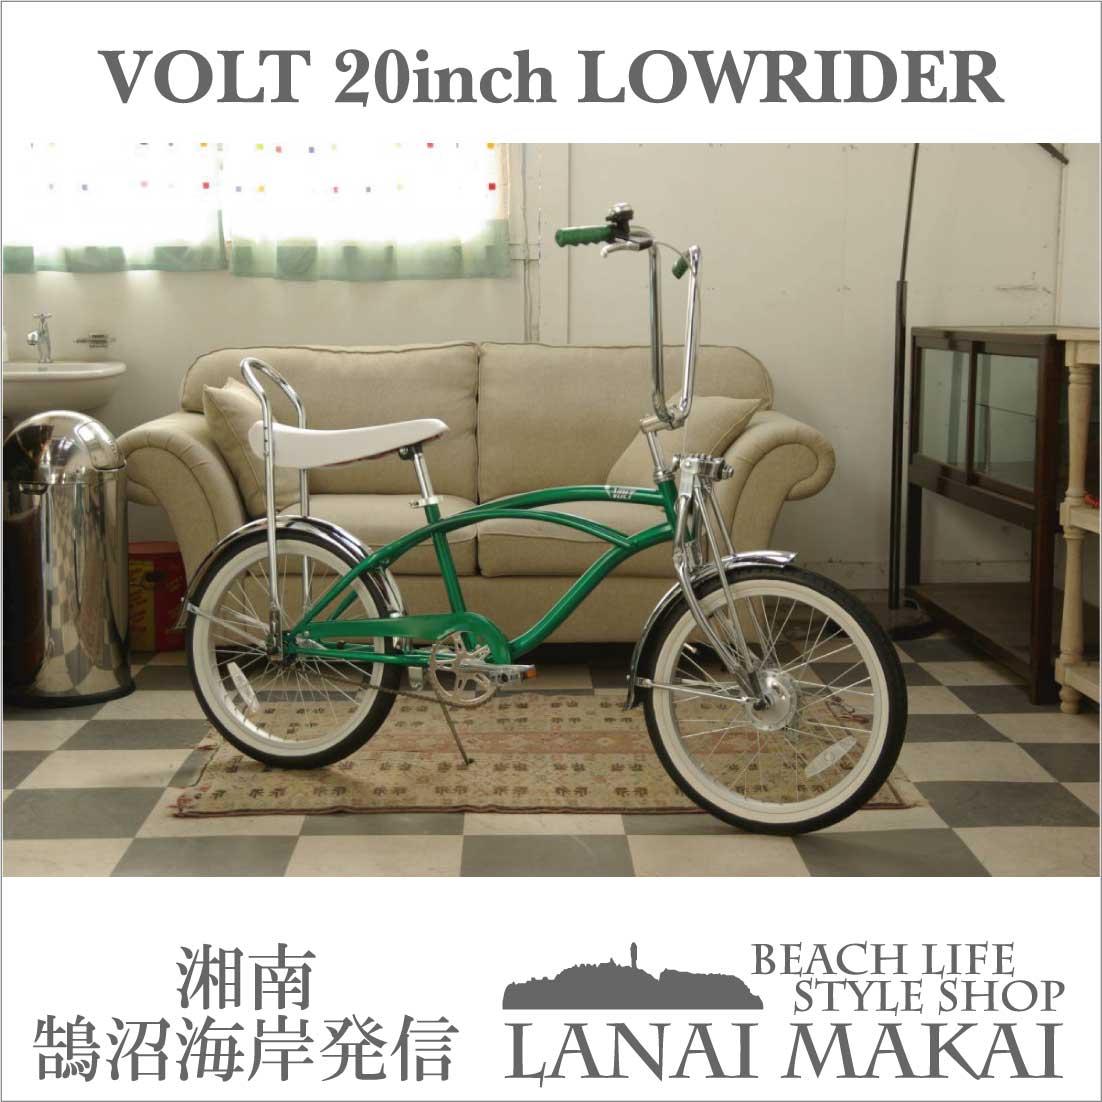 "【VOLT!!】ローライダーバイクCOLOR:グリン""湘南鵠沼海岸発信""自転車 メンズ レディース 20インチ レインボー VOLT"